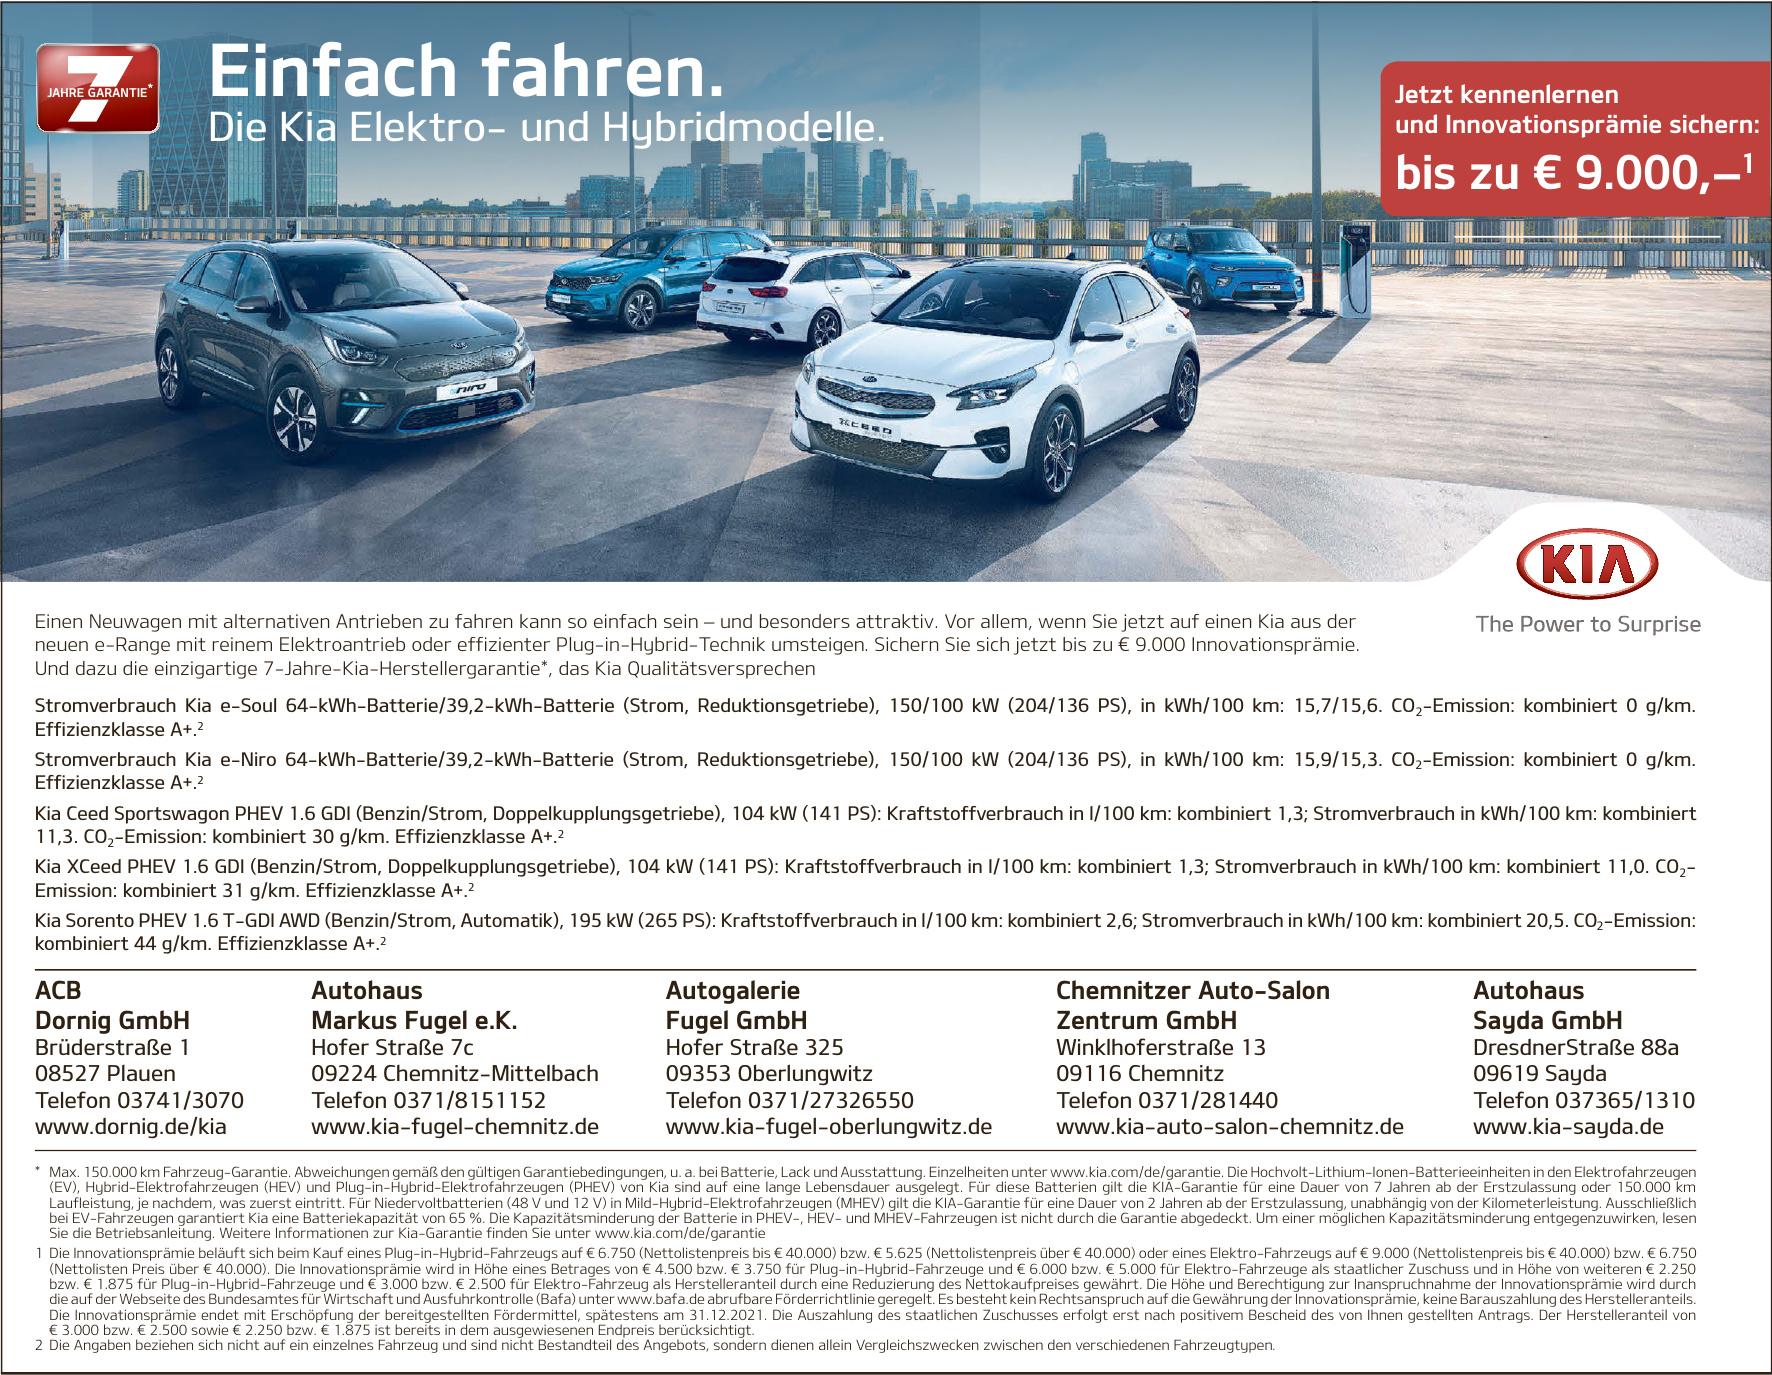 ACB Dornig GmbH